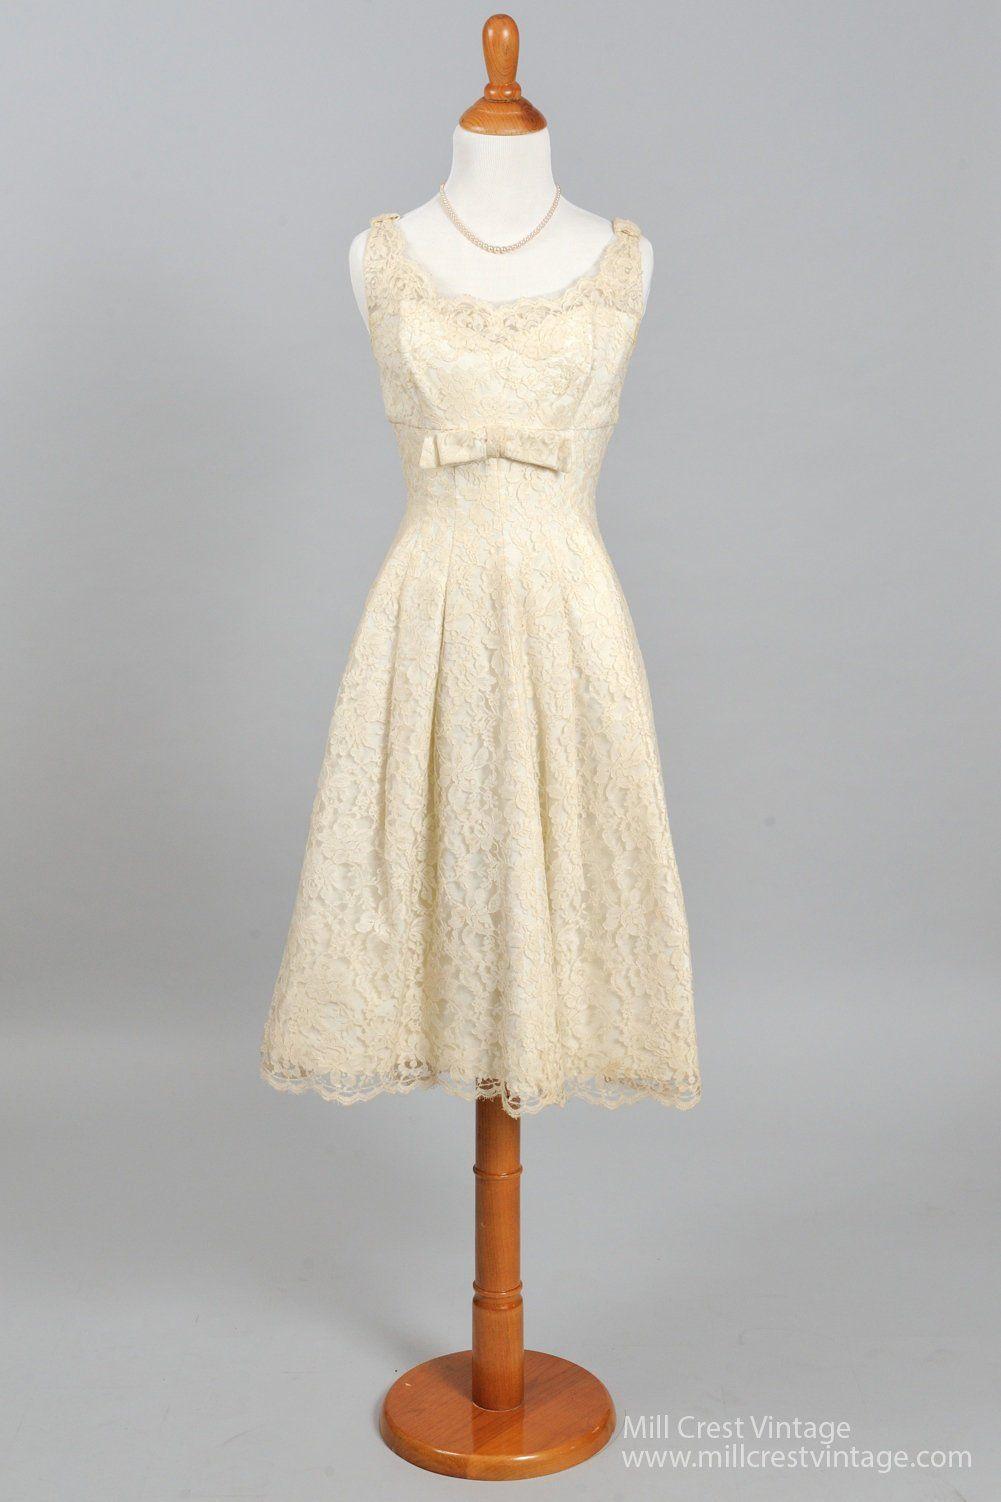 1960 wedding dresses   Lace Empire Vintage Wedding Dress  GbY WEDDING DRESS uACC